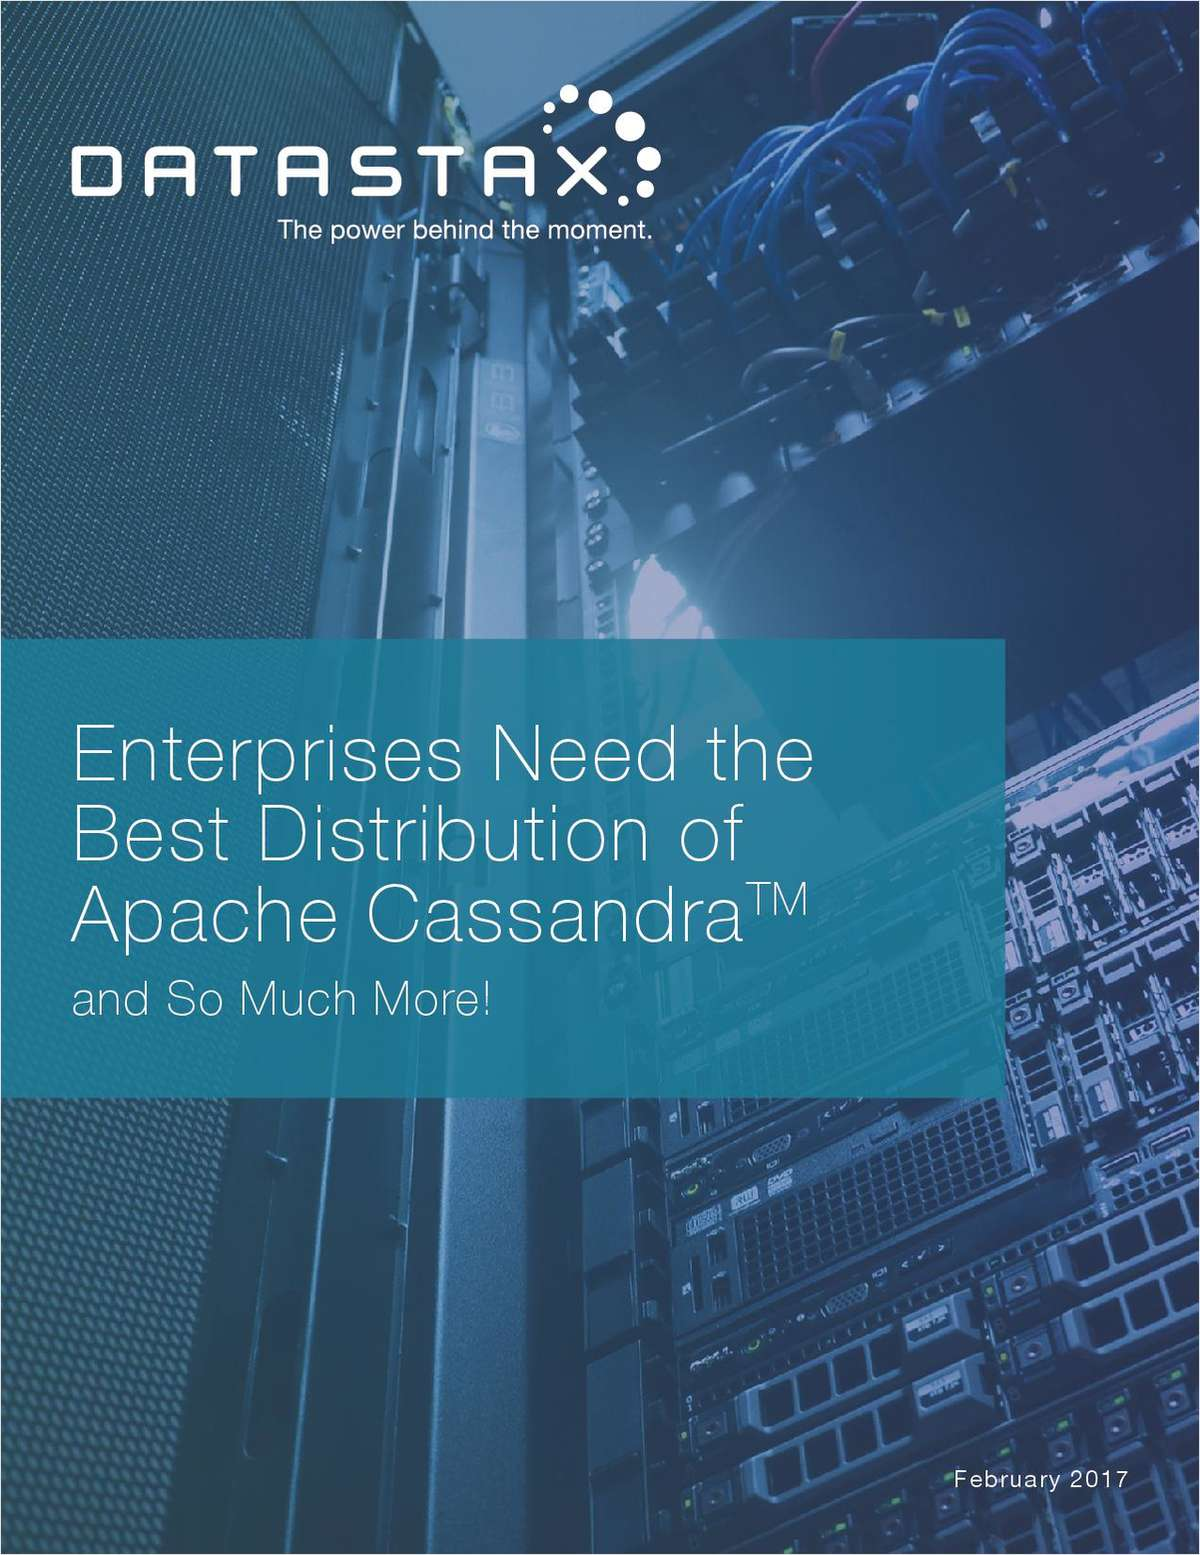 The Best Distribution of Apache Cassandra